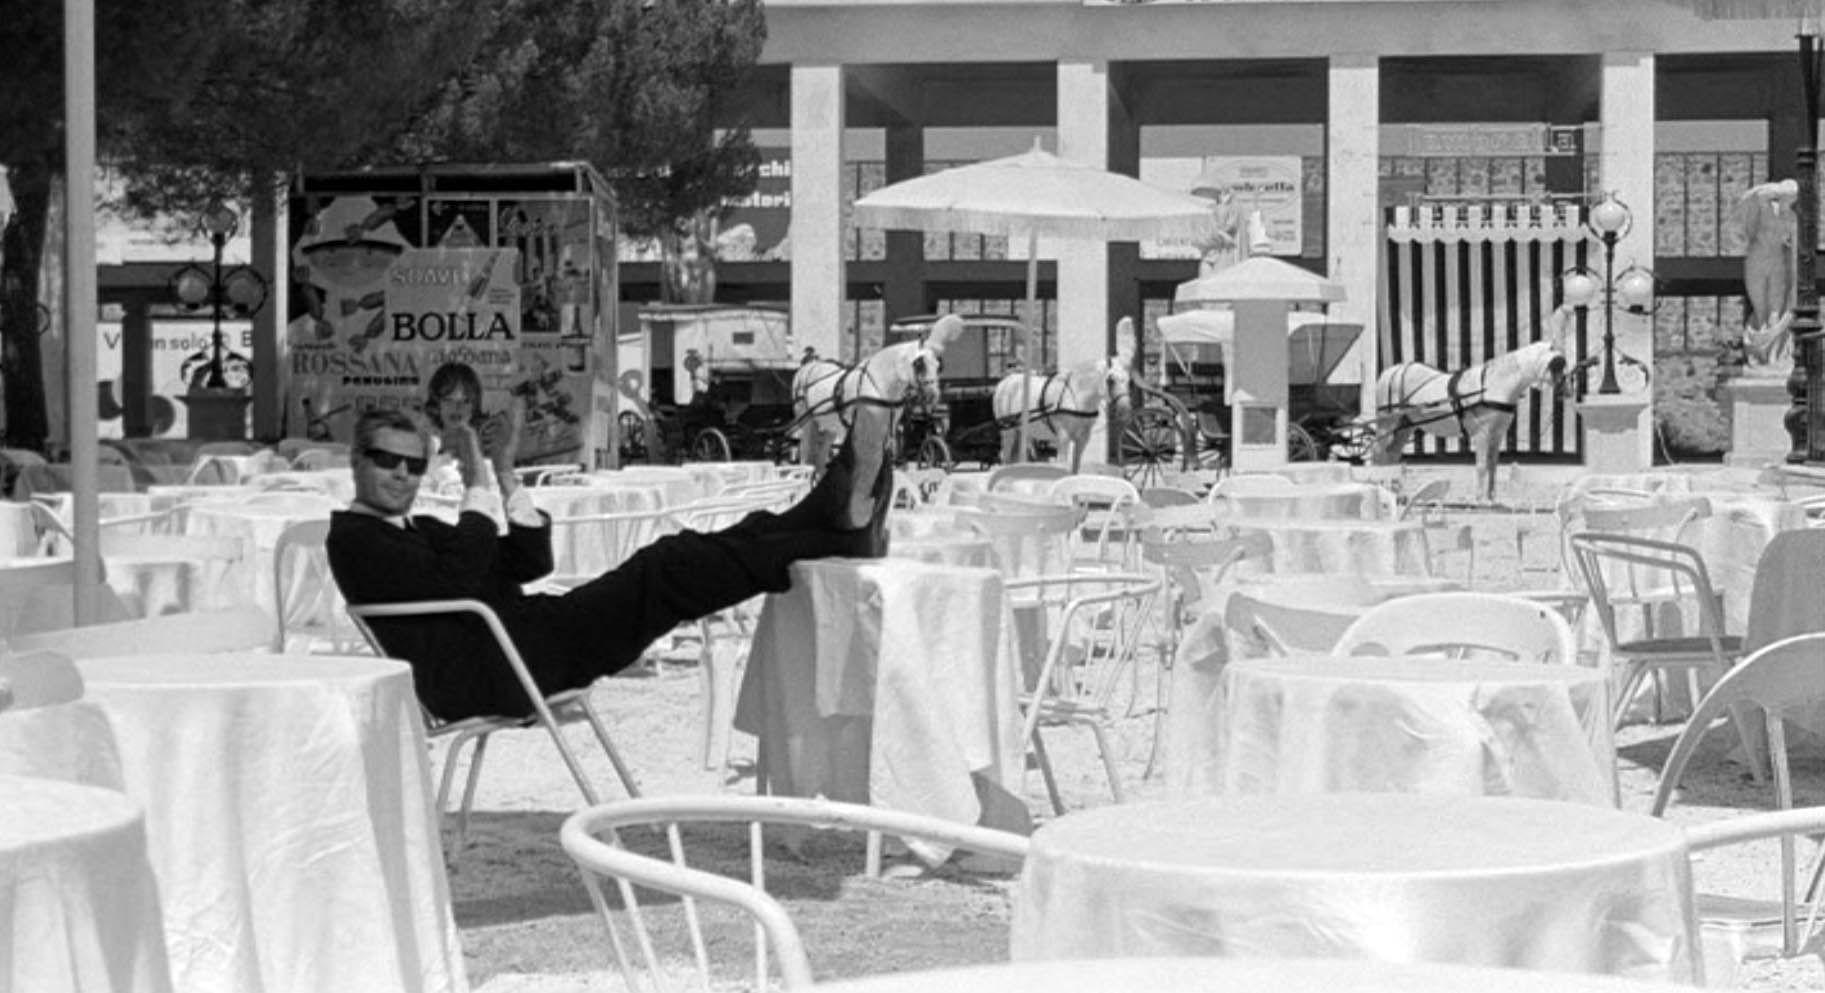 otto e mezzo | Italian movies | Pinterest | Cinema, Films and Movie